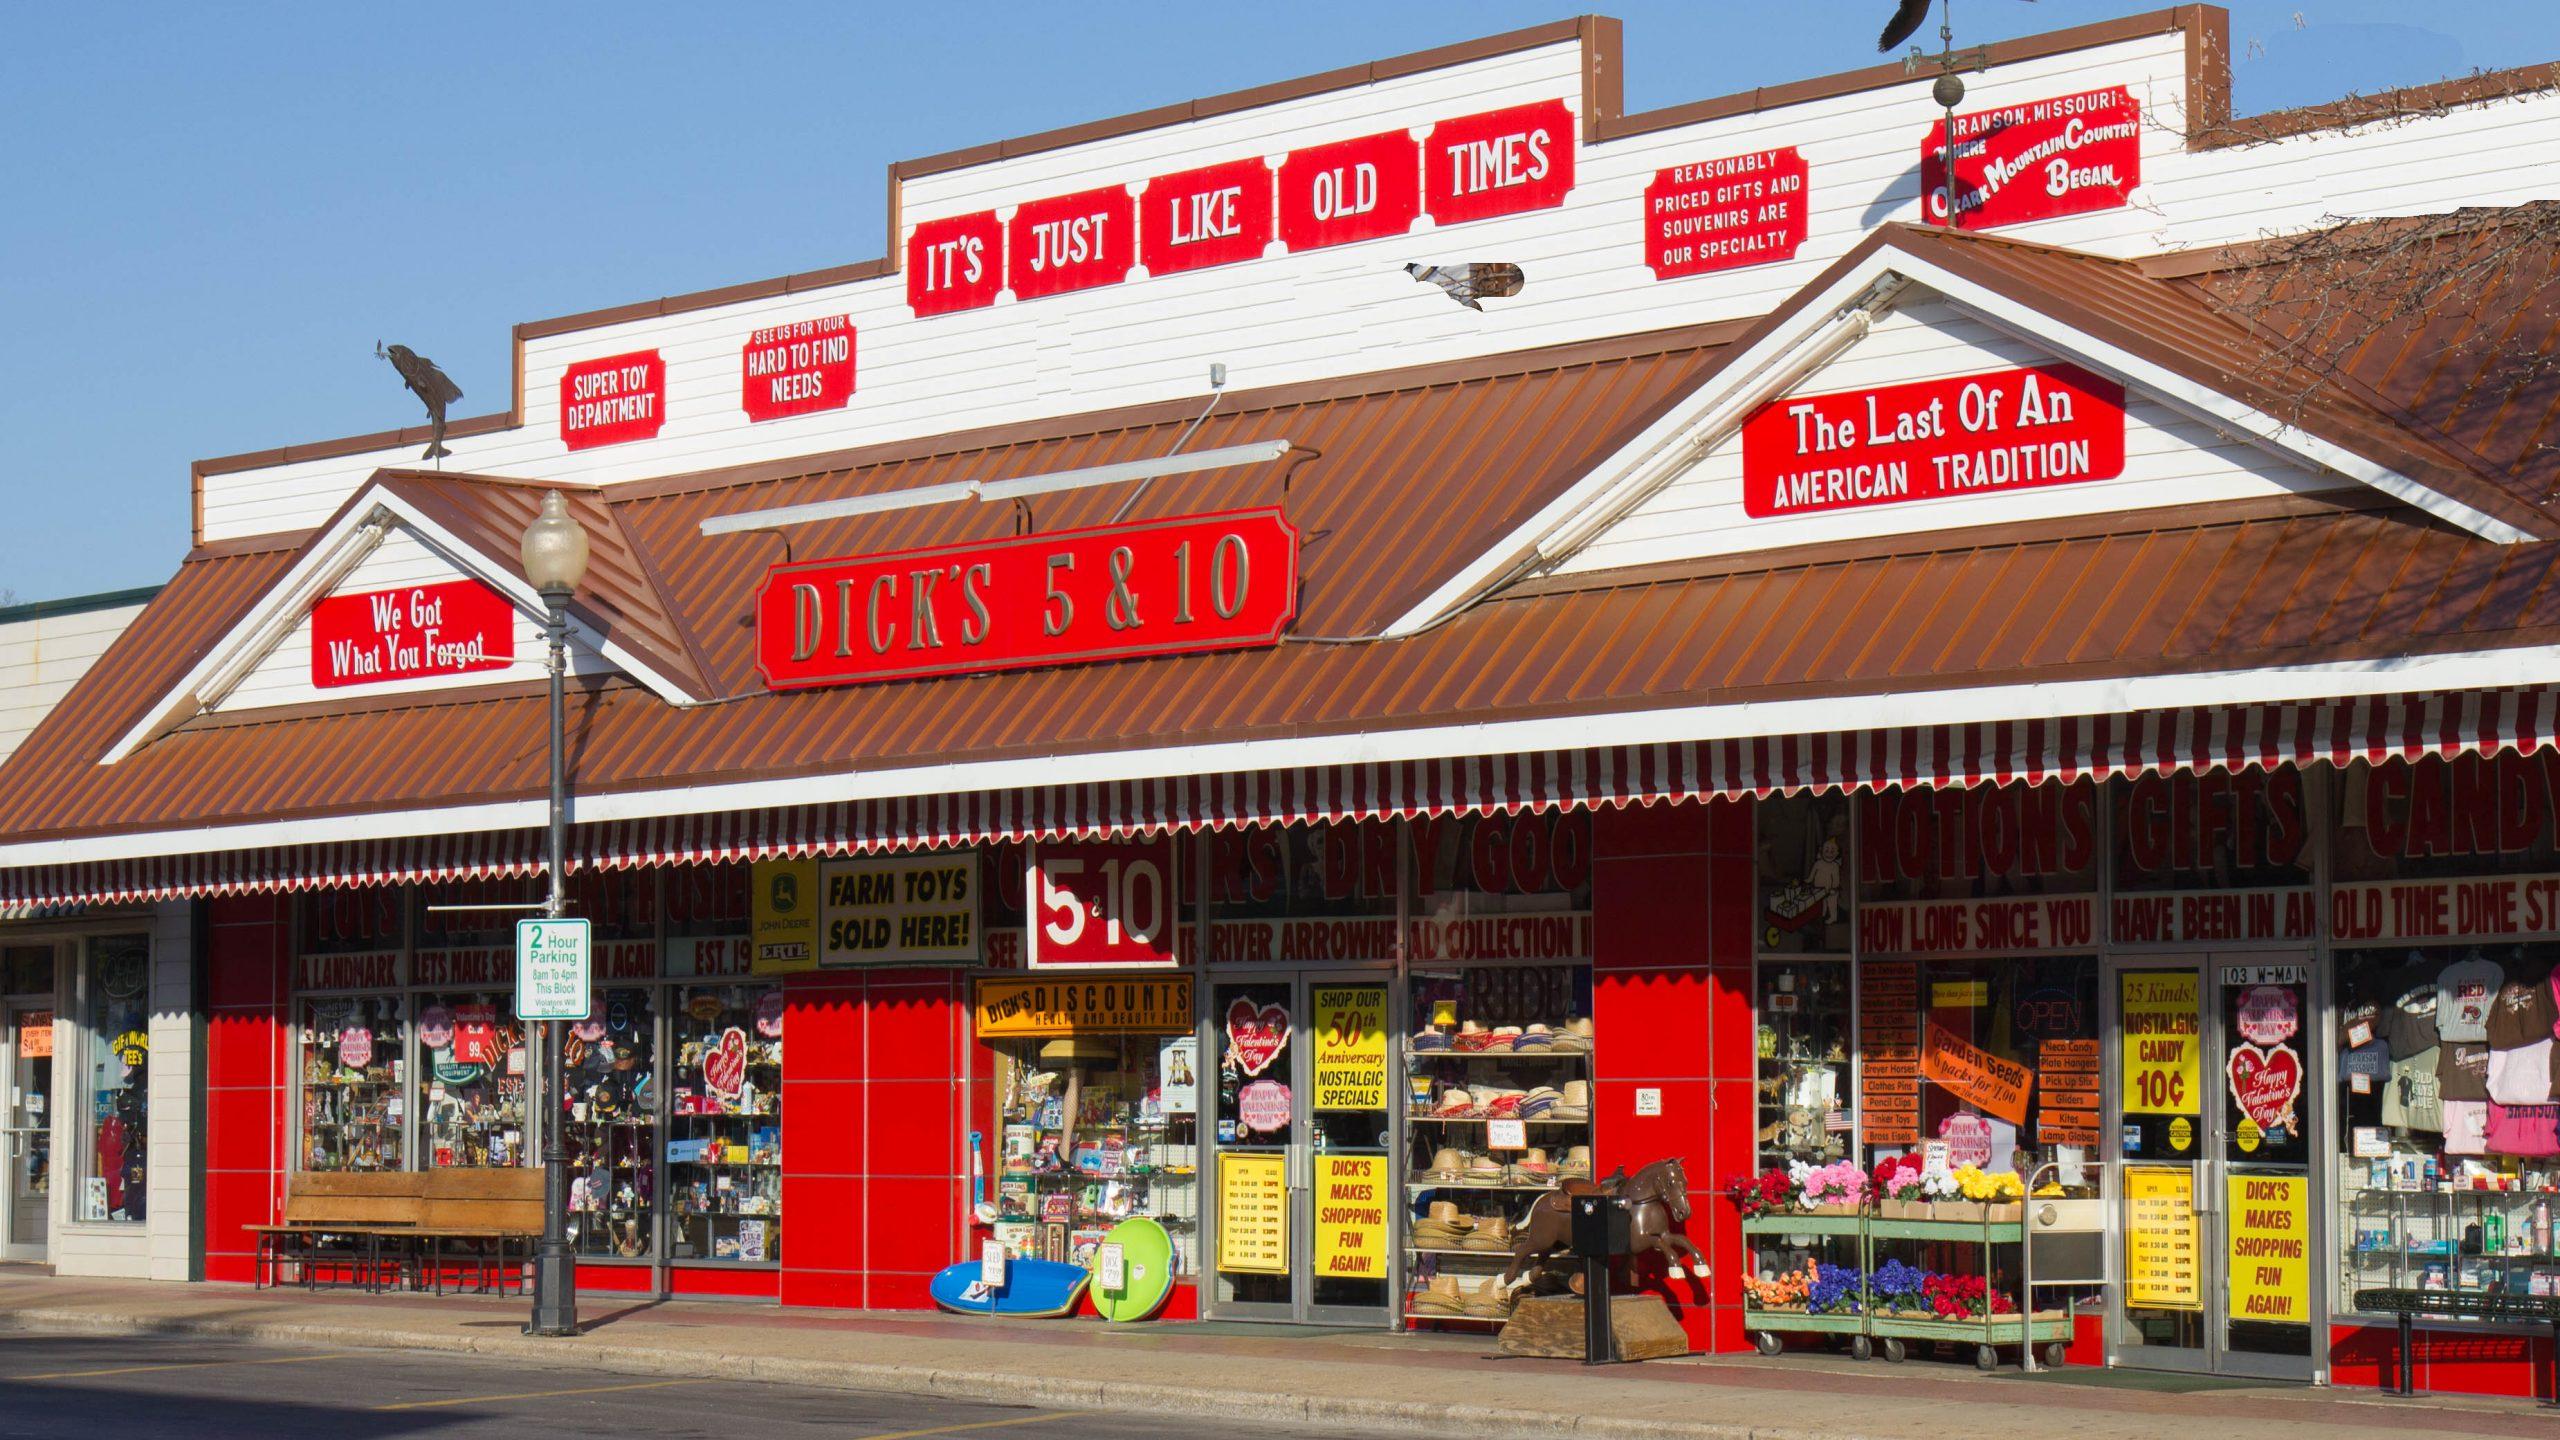 200225 Dicks 5 10 Hitoric Downtown Branson 1 scaled - Are Branson's corona Virus ordinances most restrictive in SW Missouri?